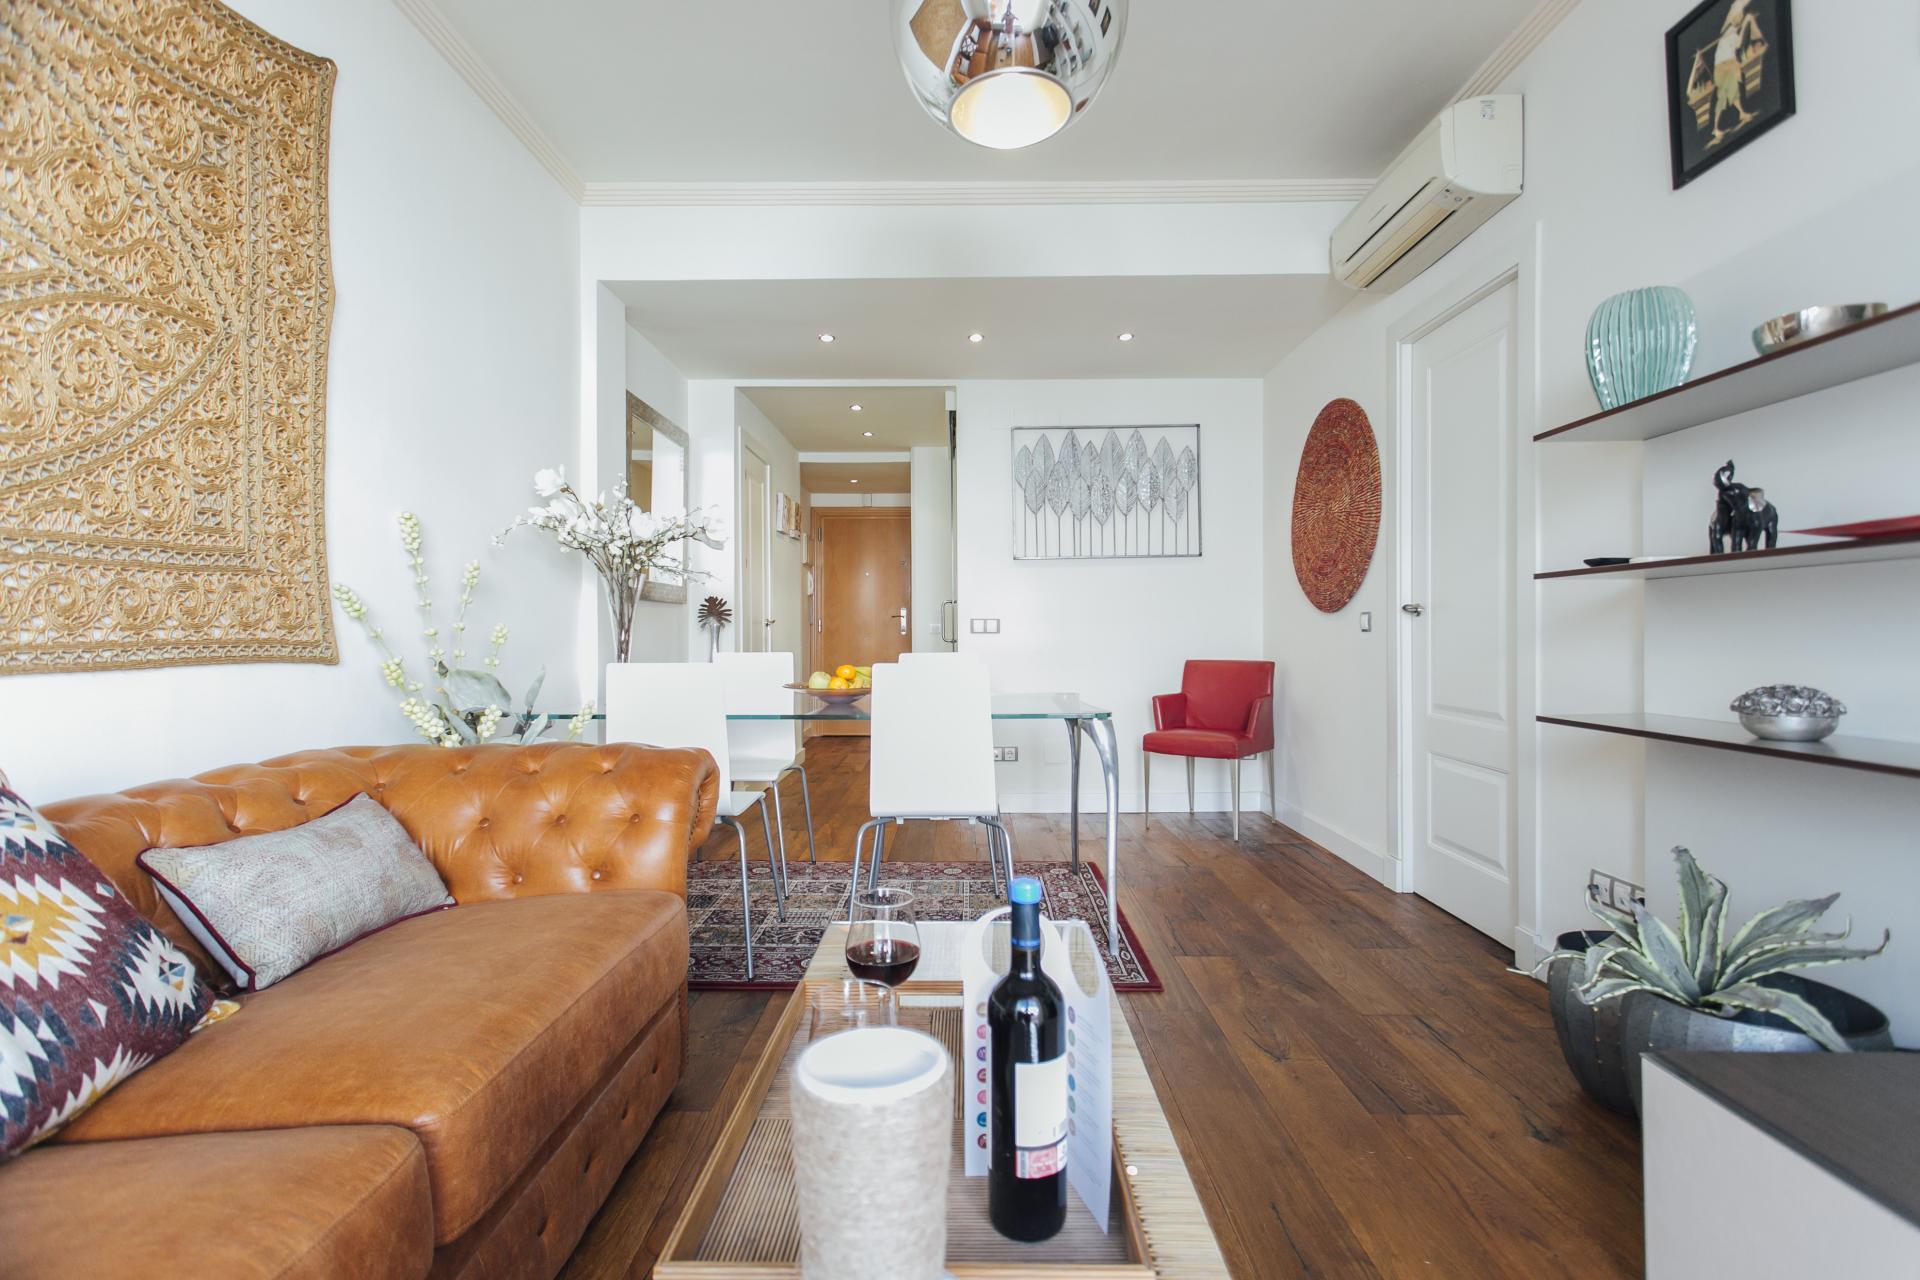 Lounge at Arjona Apartment, Centre, Seville